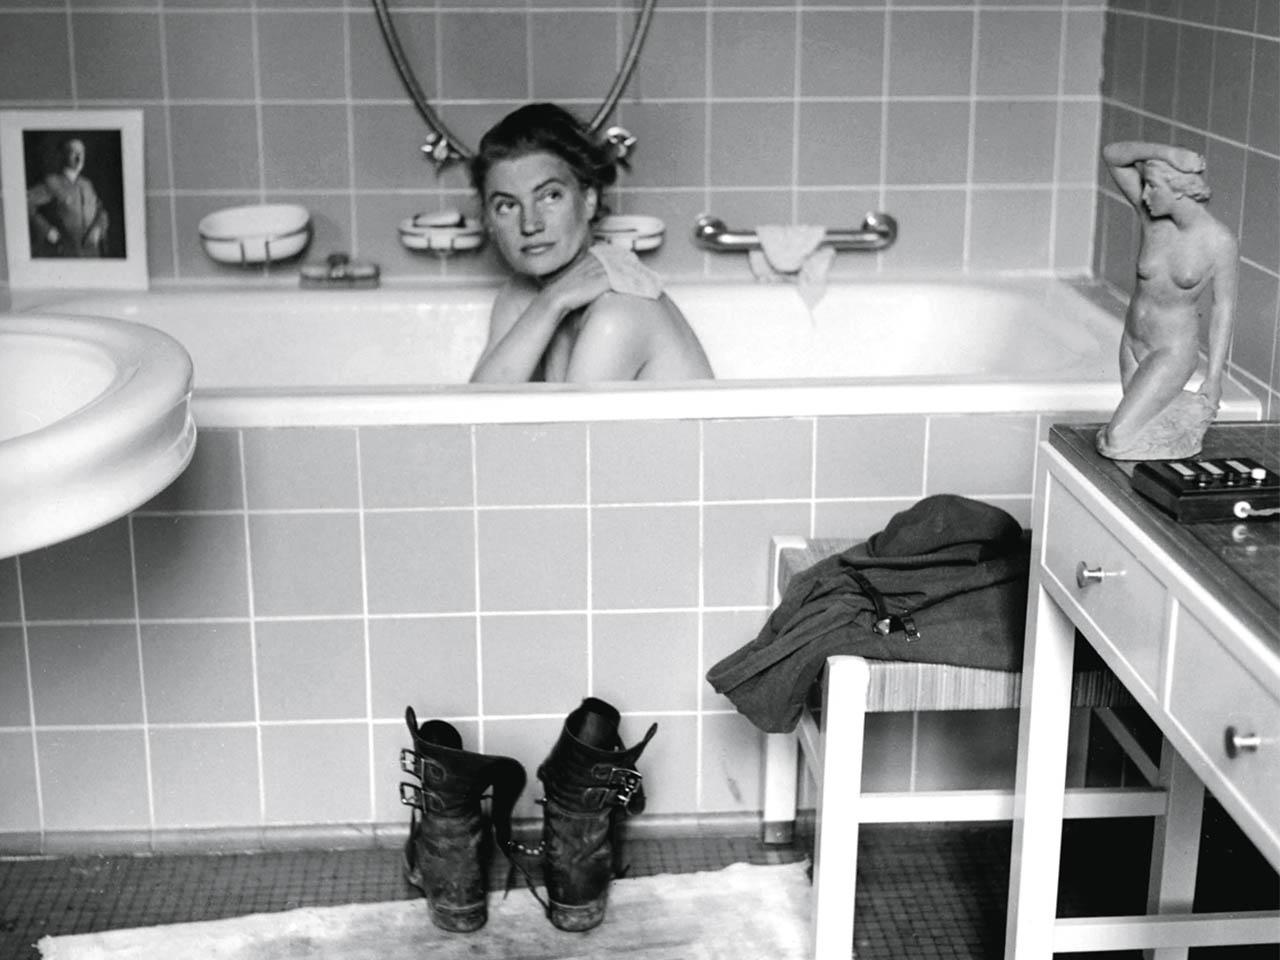 David Scherman <br>Lee Miller en la bañera del Führer 1945